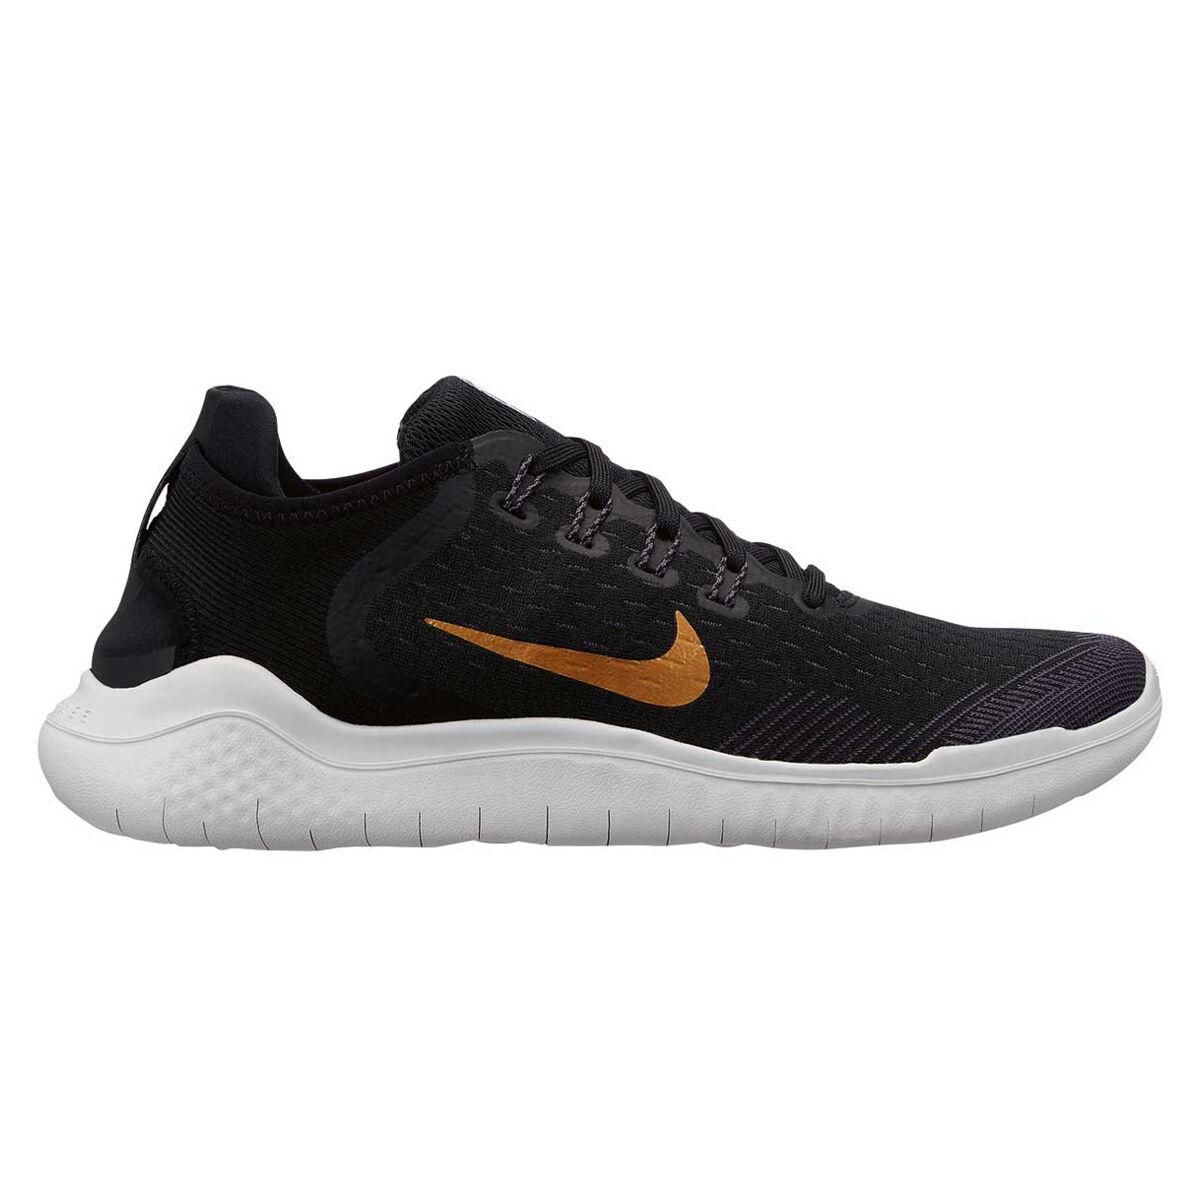 Nike Free RN 2018 Womens Running Shoes Black Gold US 6.5